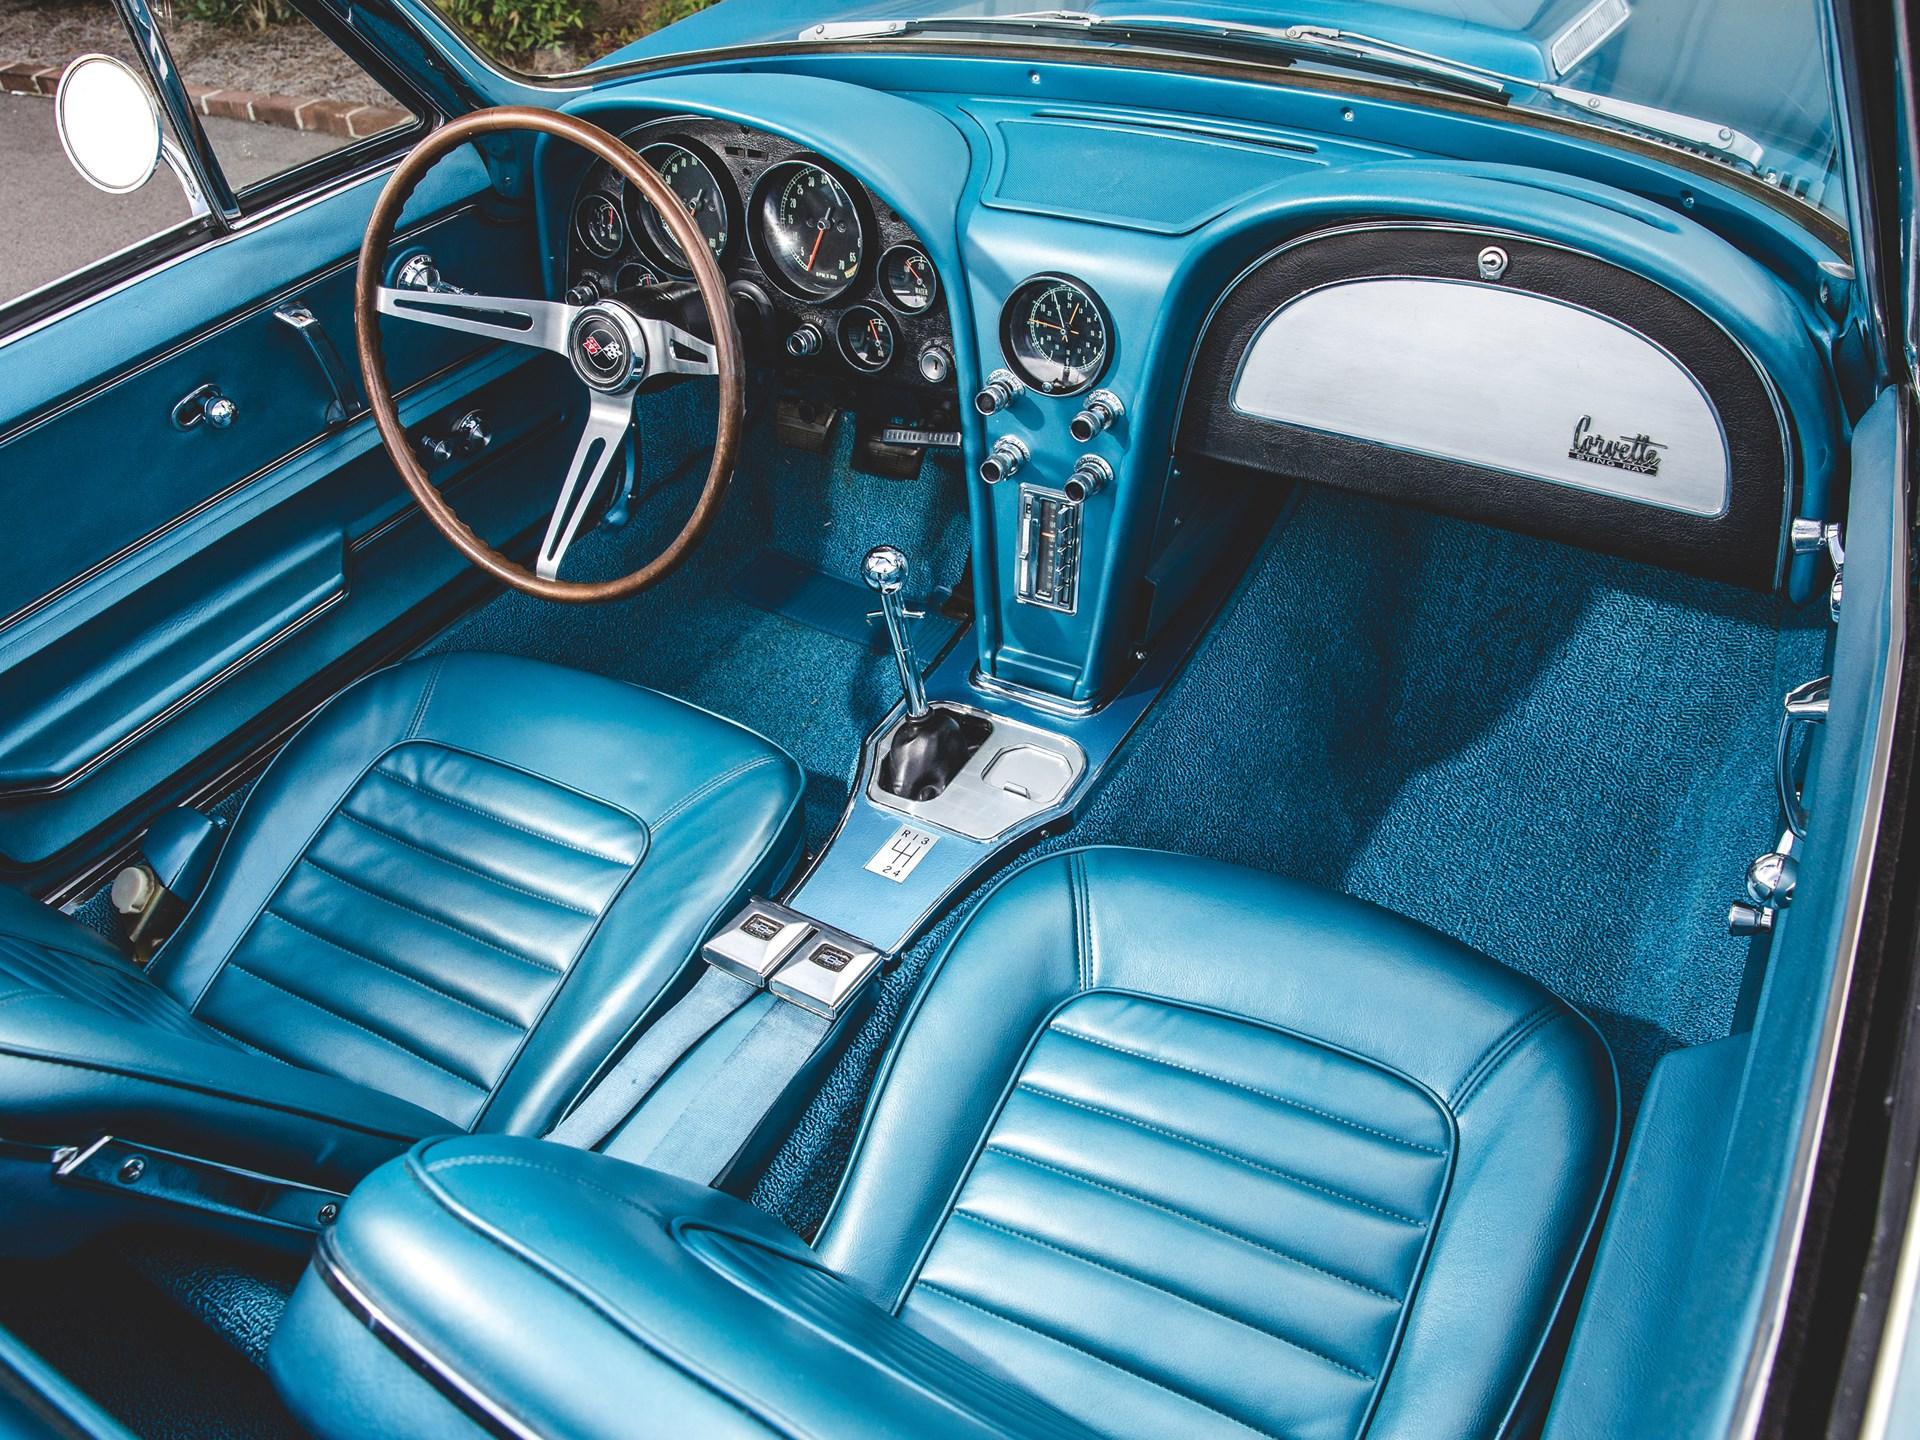 1966 Chevrolet Corvette Sting Ray Convertible